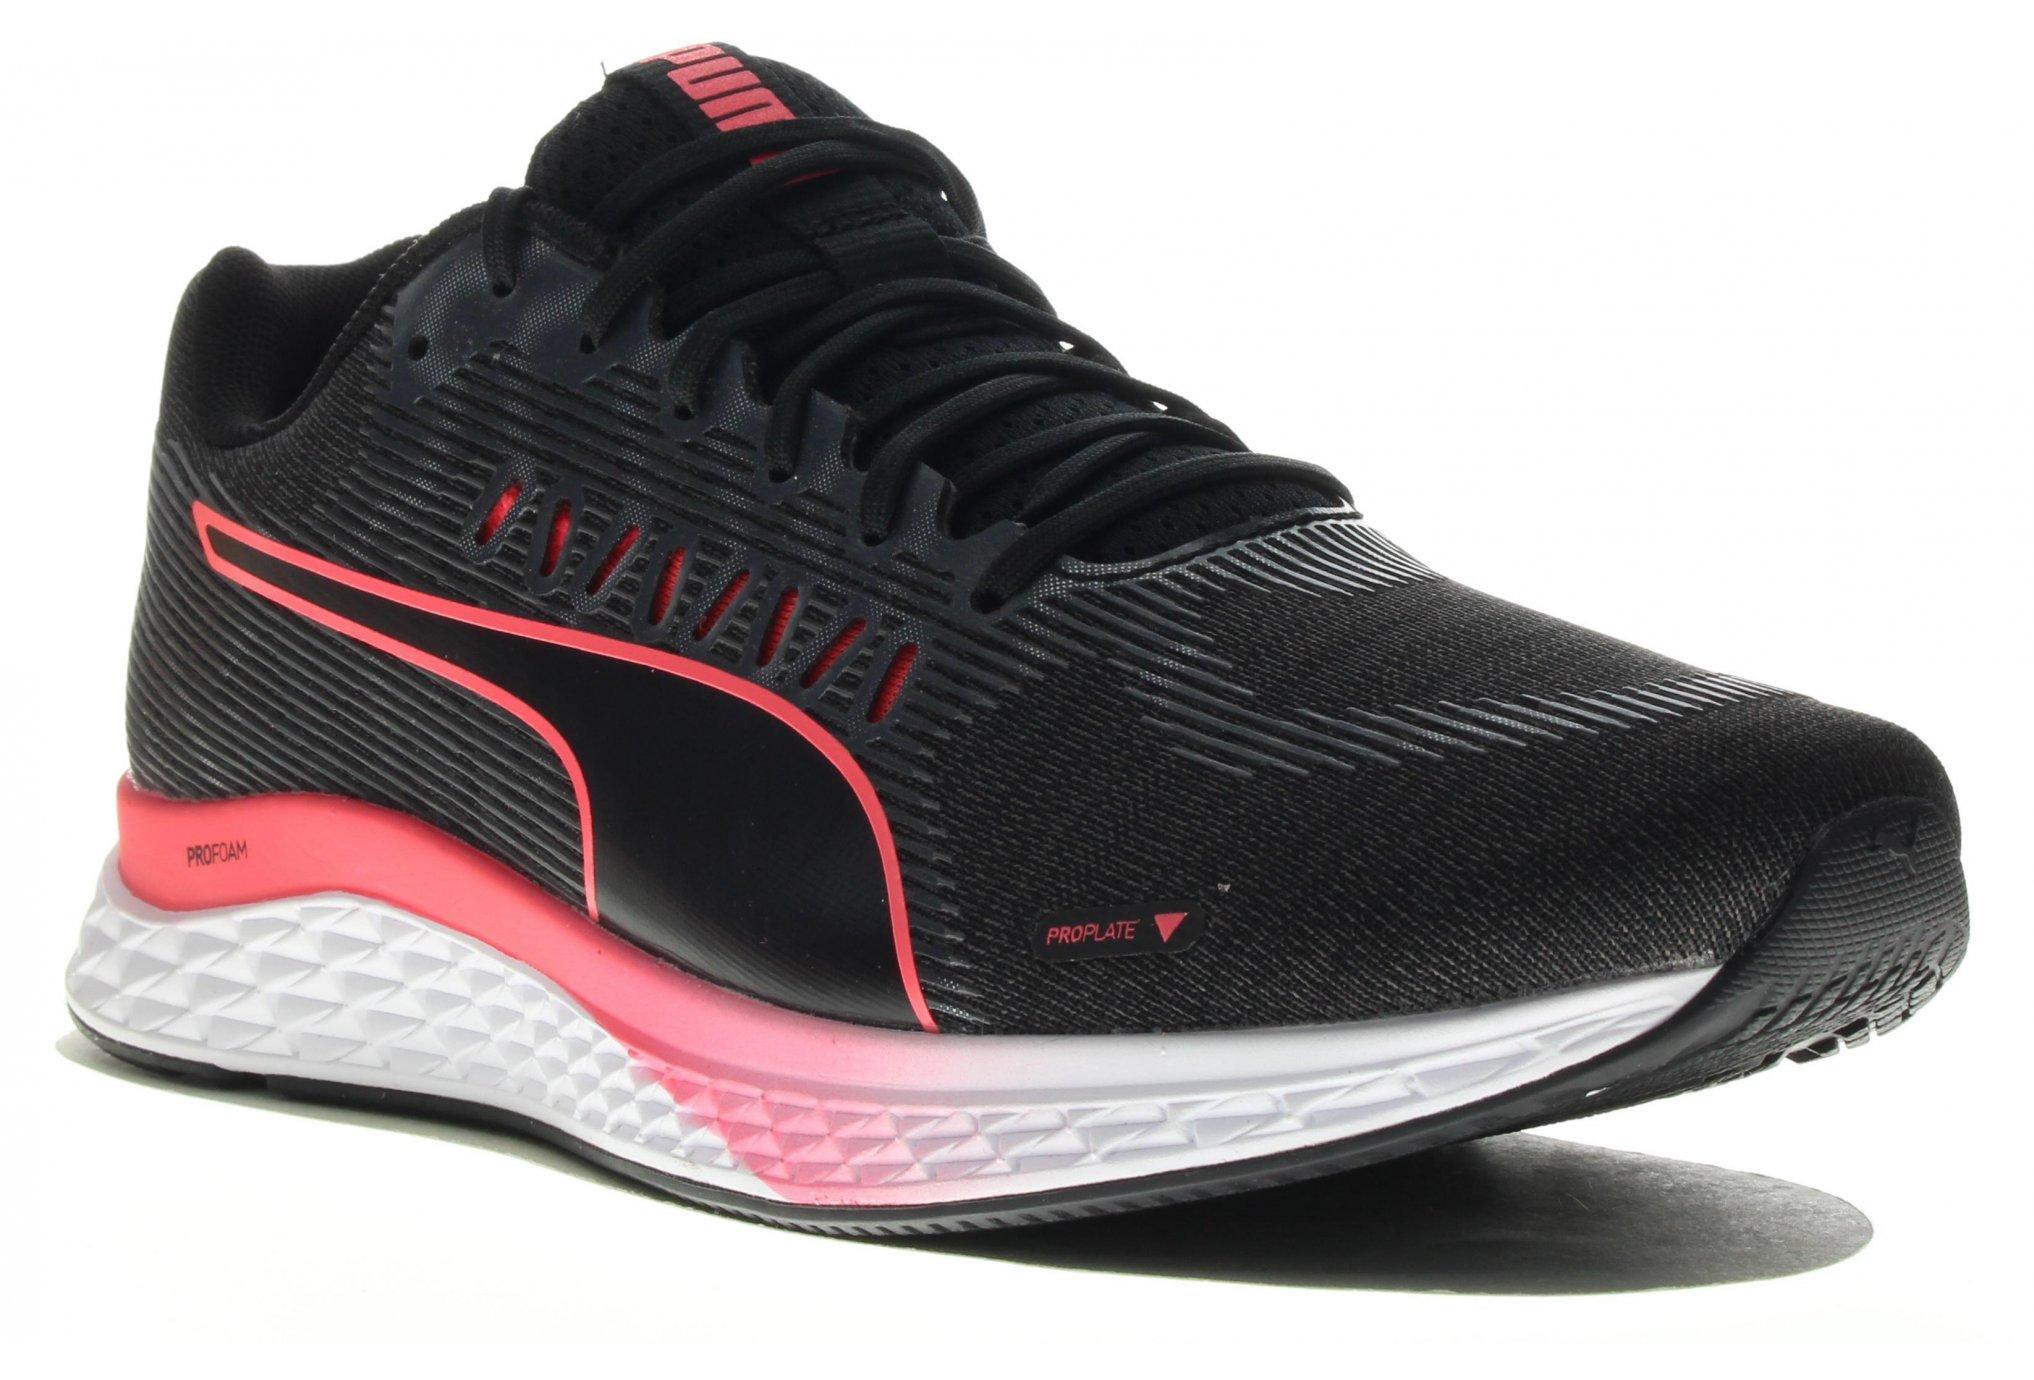 Puma Speed Sutamina W Diététique Chaussures femme